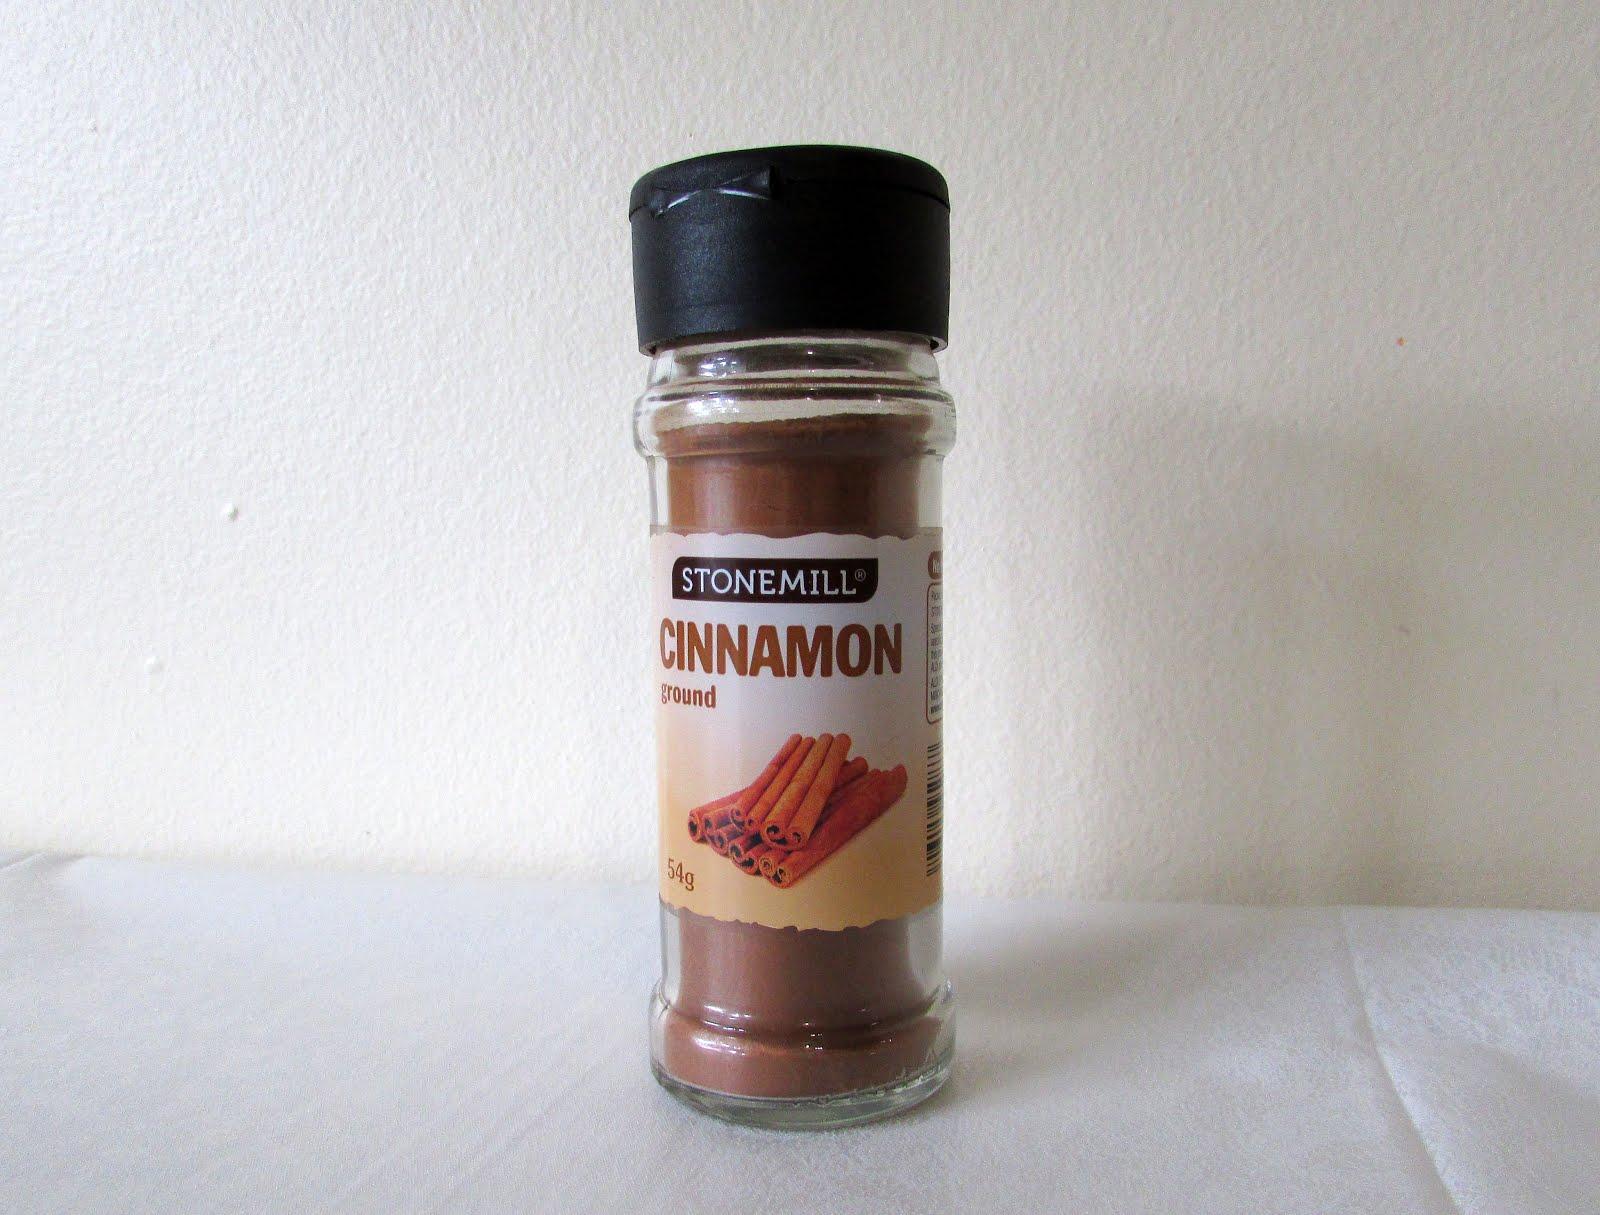 Hot Chocolate 2/13: Cinnamon Hot Chocolate